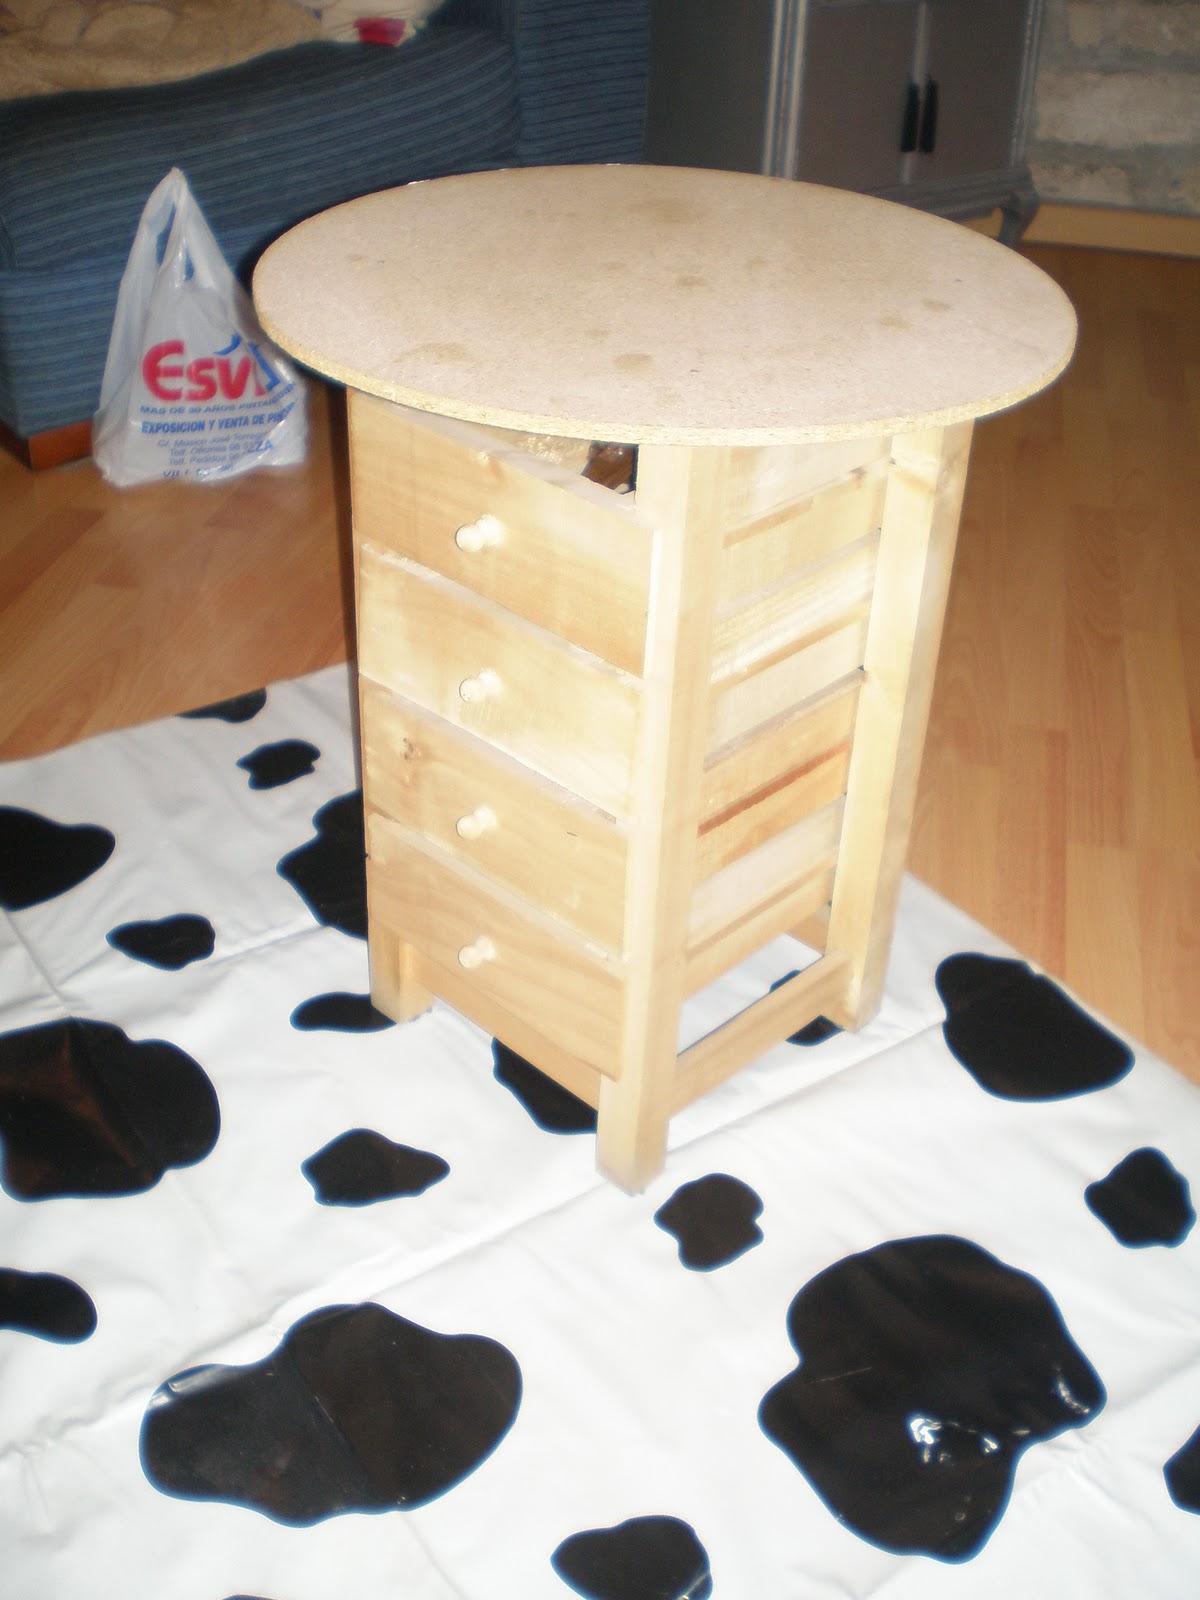 Decora facil y barato mesa camilla - Decorar mesa camilla ...